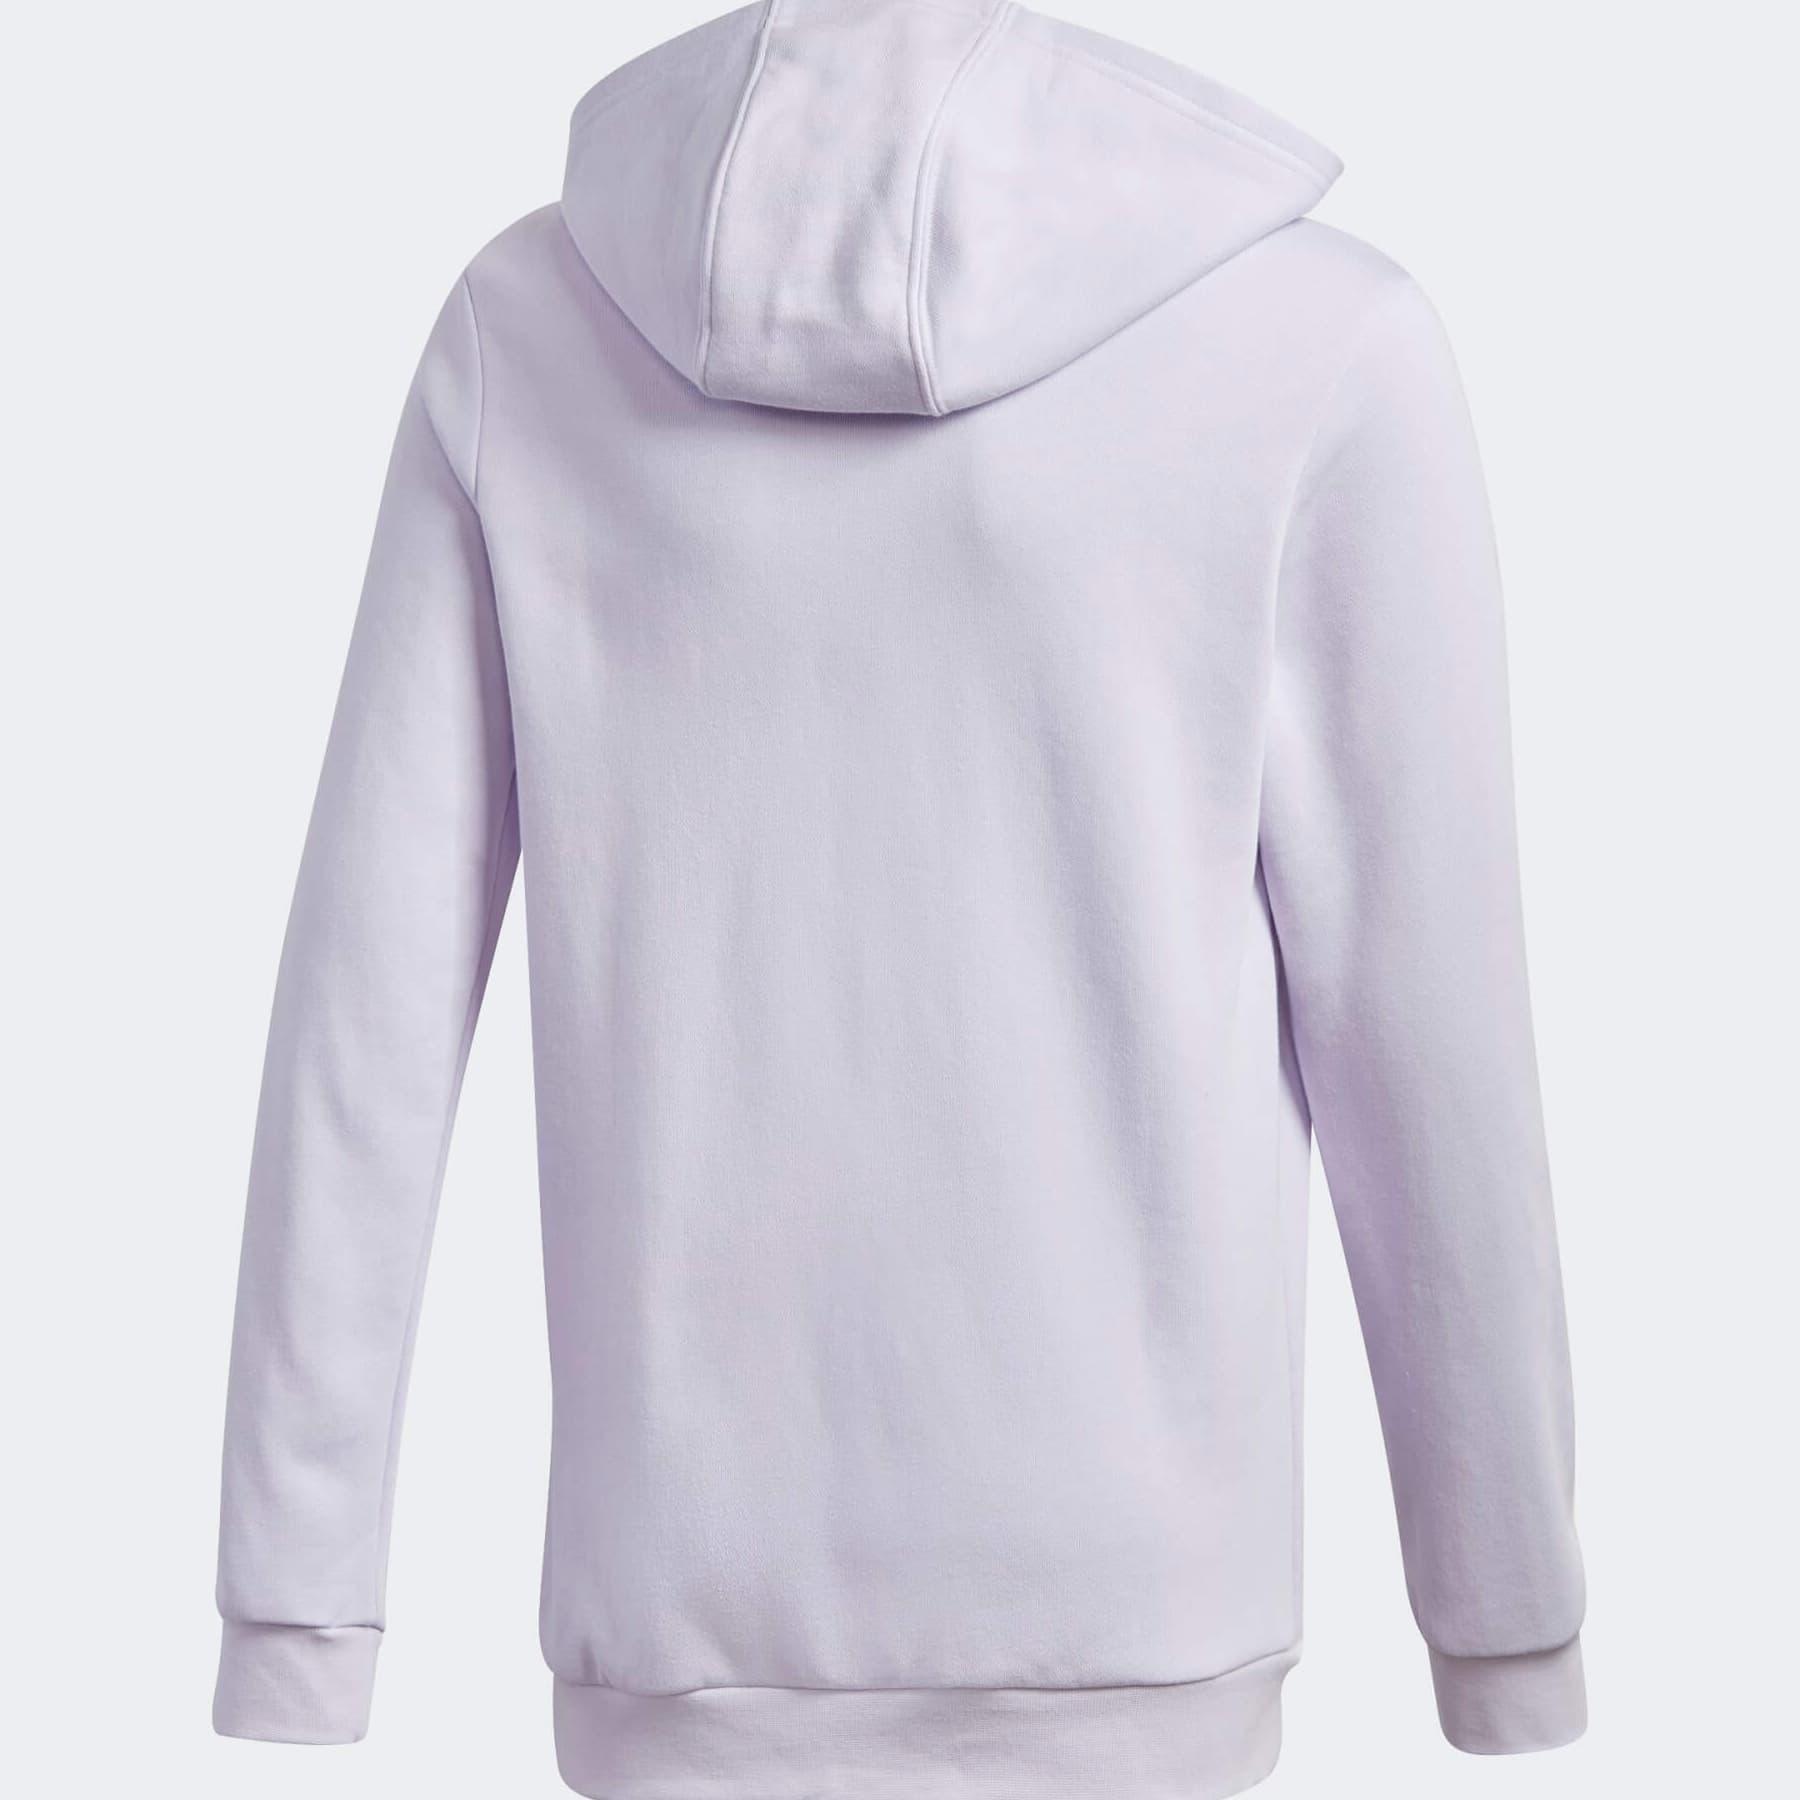 adidas Kapüşonlu Çocuk Mor Sweatshirt